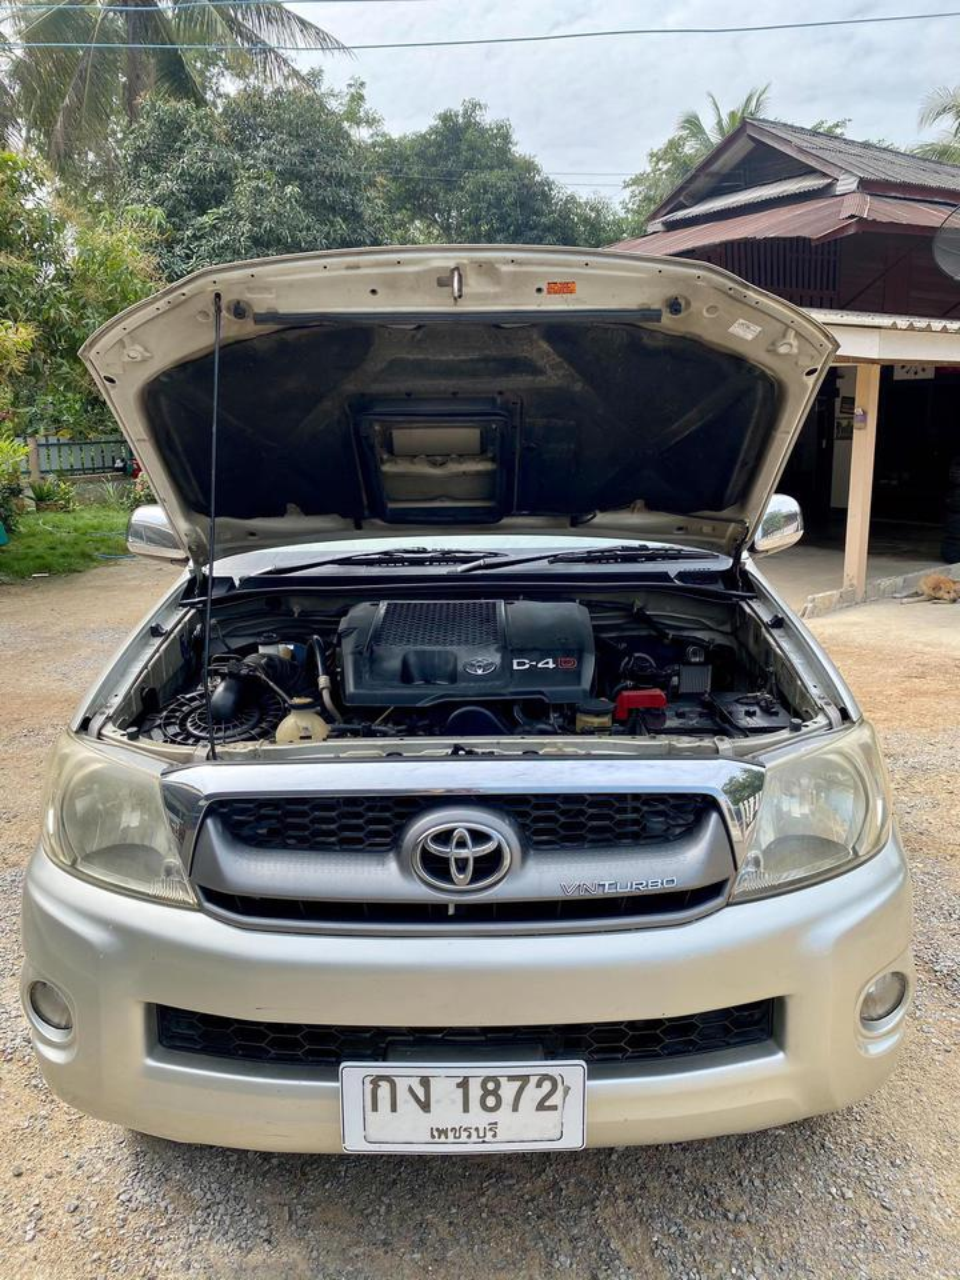 Toyota vigo พรีรันเนอร์ 2.5E 4ประตู Toyota vigo พรีรันเนอร์ 2.5E 4ประตู  รูปที่ 1